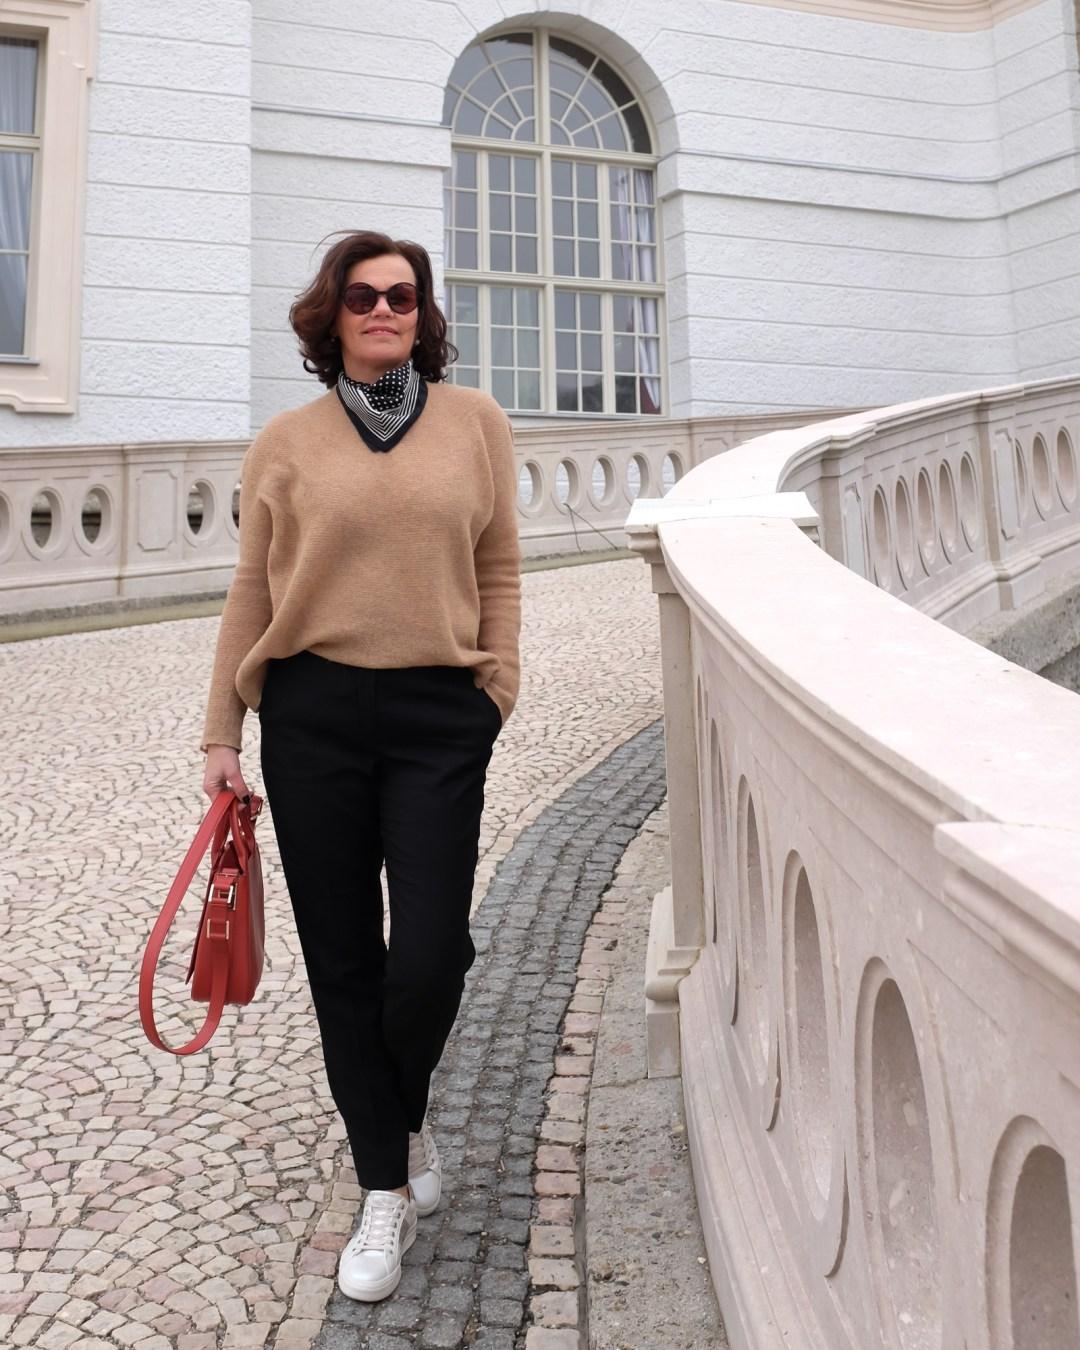 inastil, Ü50Blogger, Modeberatung, Stilberatung, Ü50Mode, Styleover50, Cabanjacke, Aignertasche, weisse Sneaker, Casualstyle, Streetstyle-11